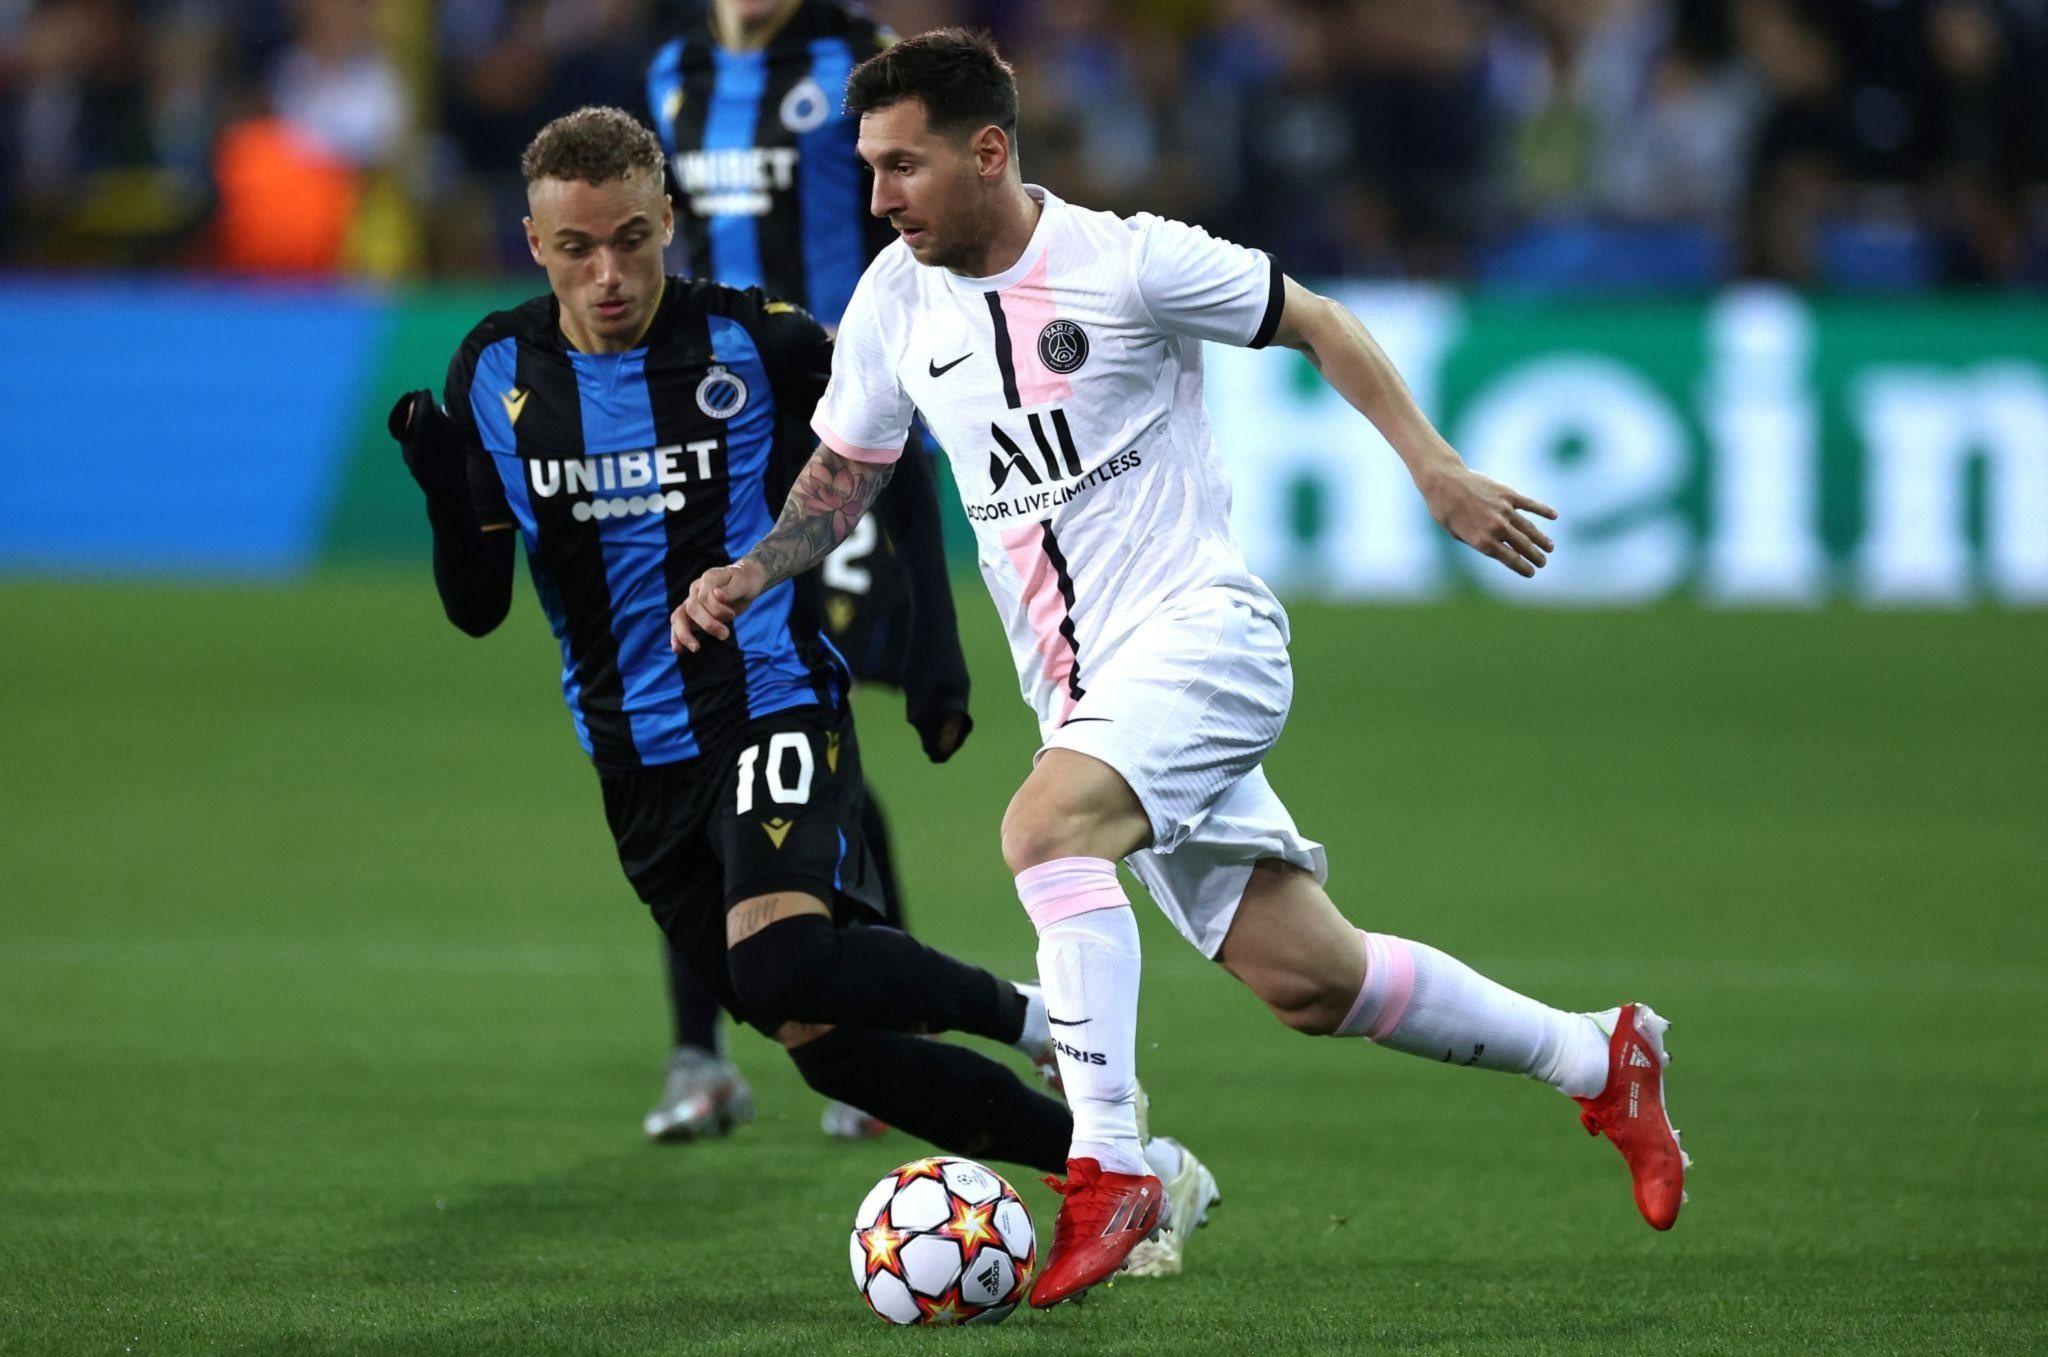 Messi attacks Club Brugge